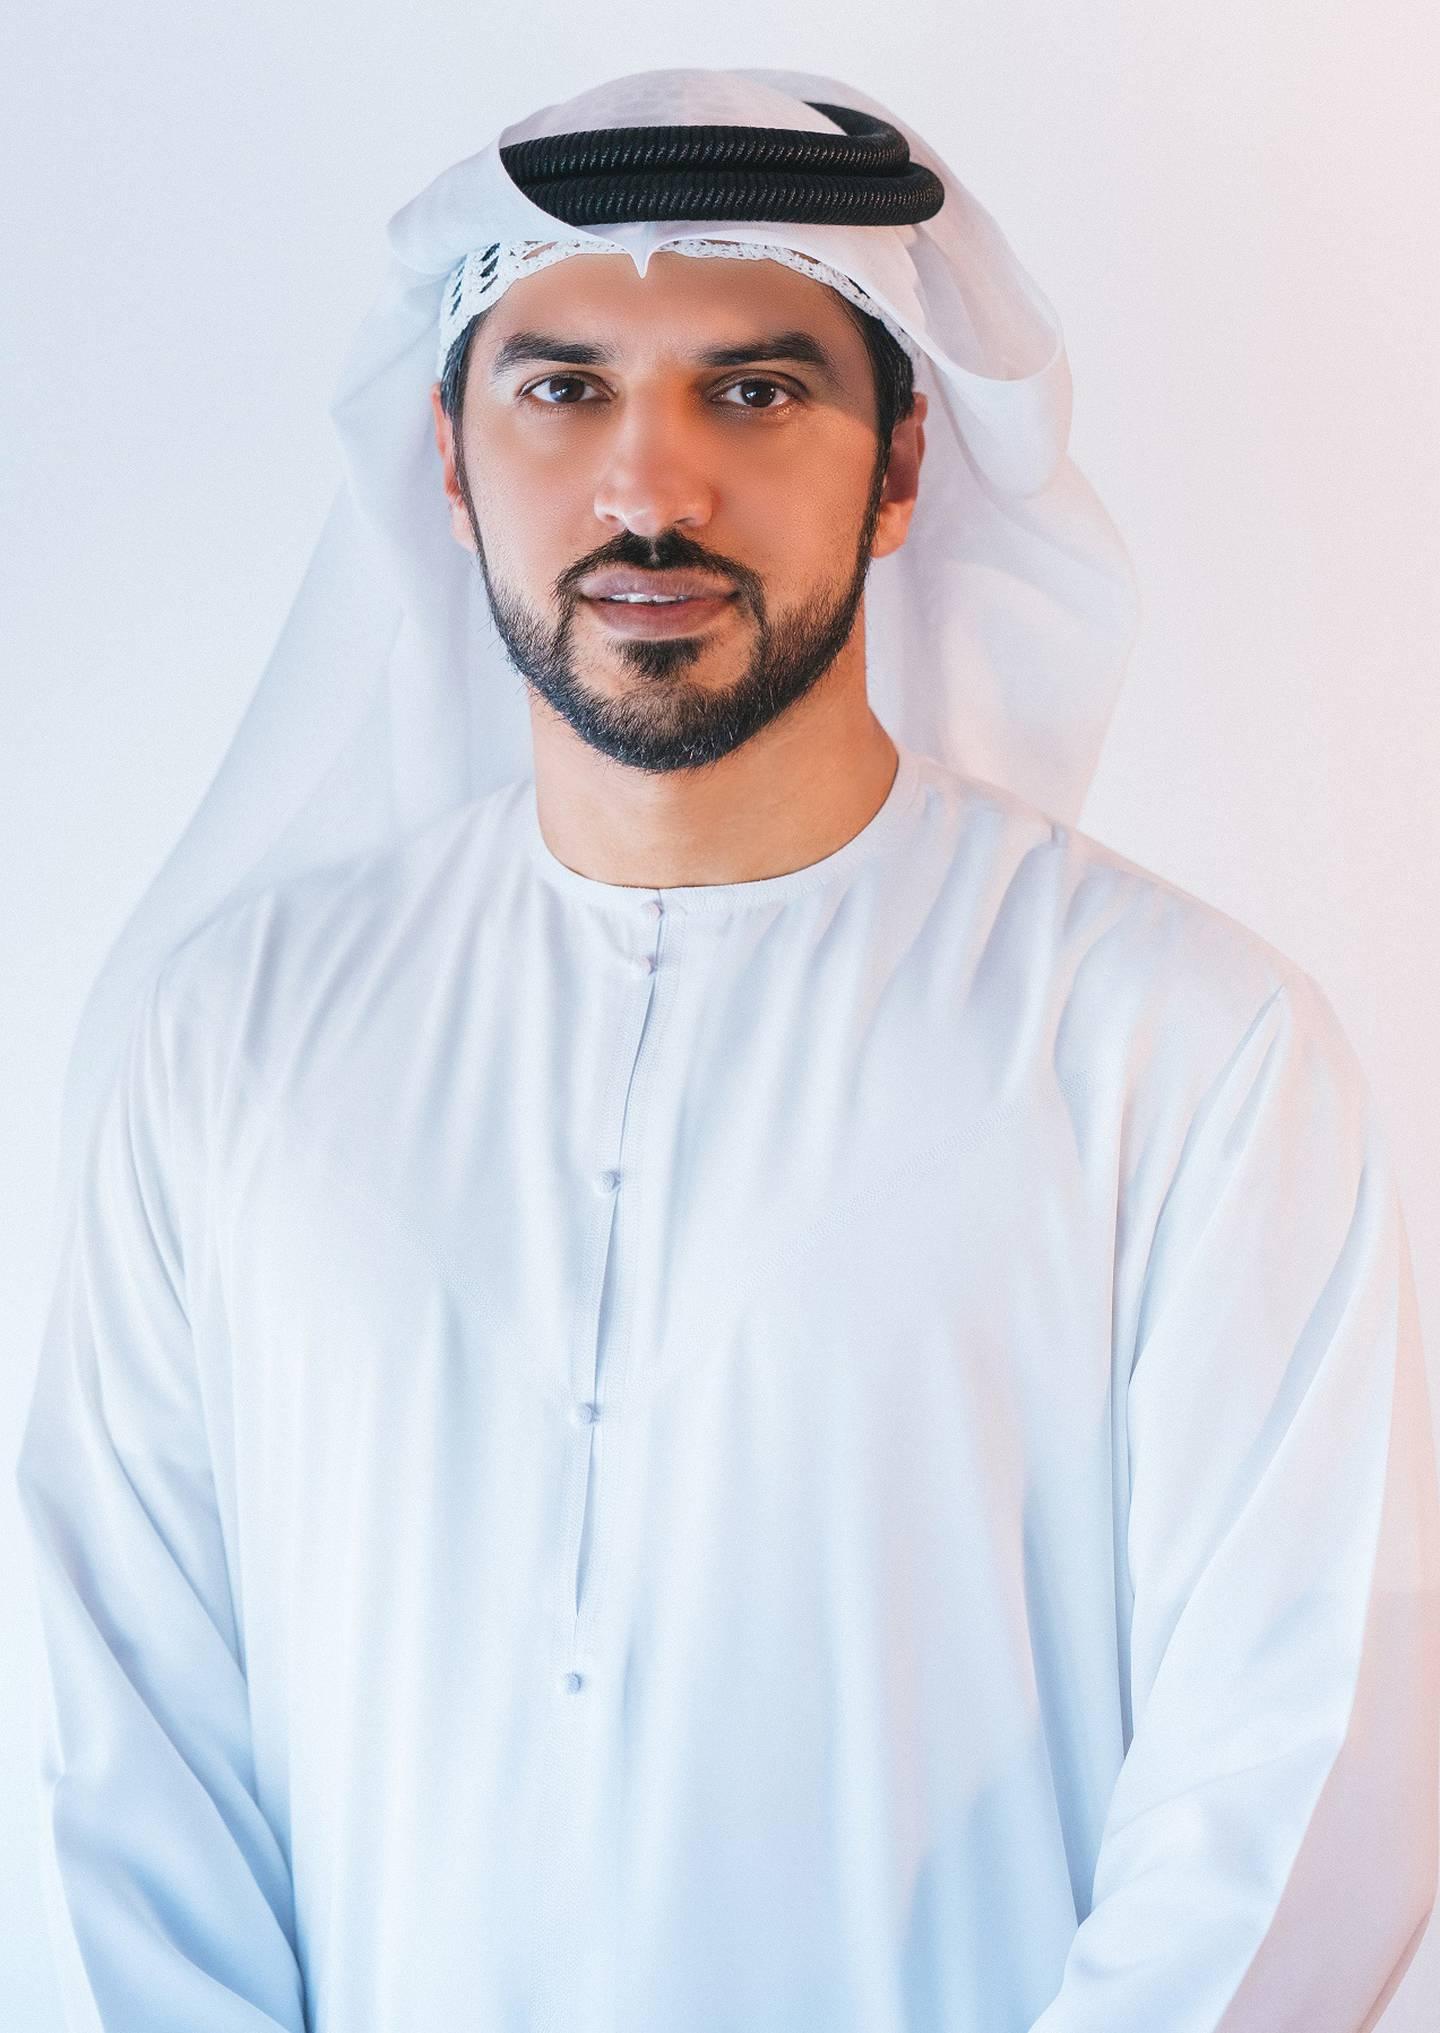 Ali Hassan Al Shaiba, Executive Director of Tourism and Marketing at DCT Abu Dhabi. Courtesy Department of Culture and Tourism – Abu Dhabi (DCT Abu Dhabi)